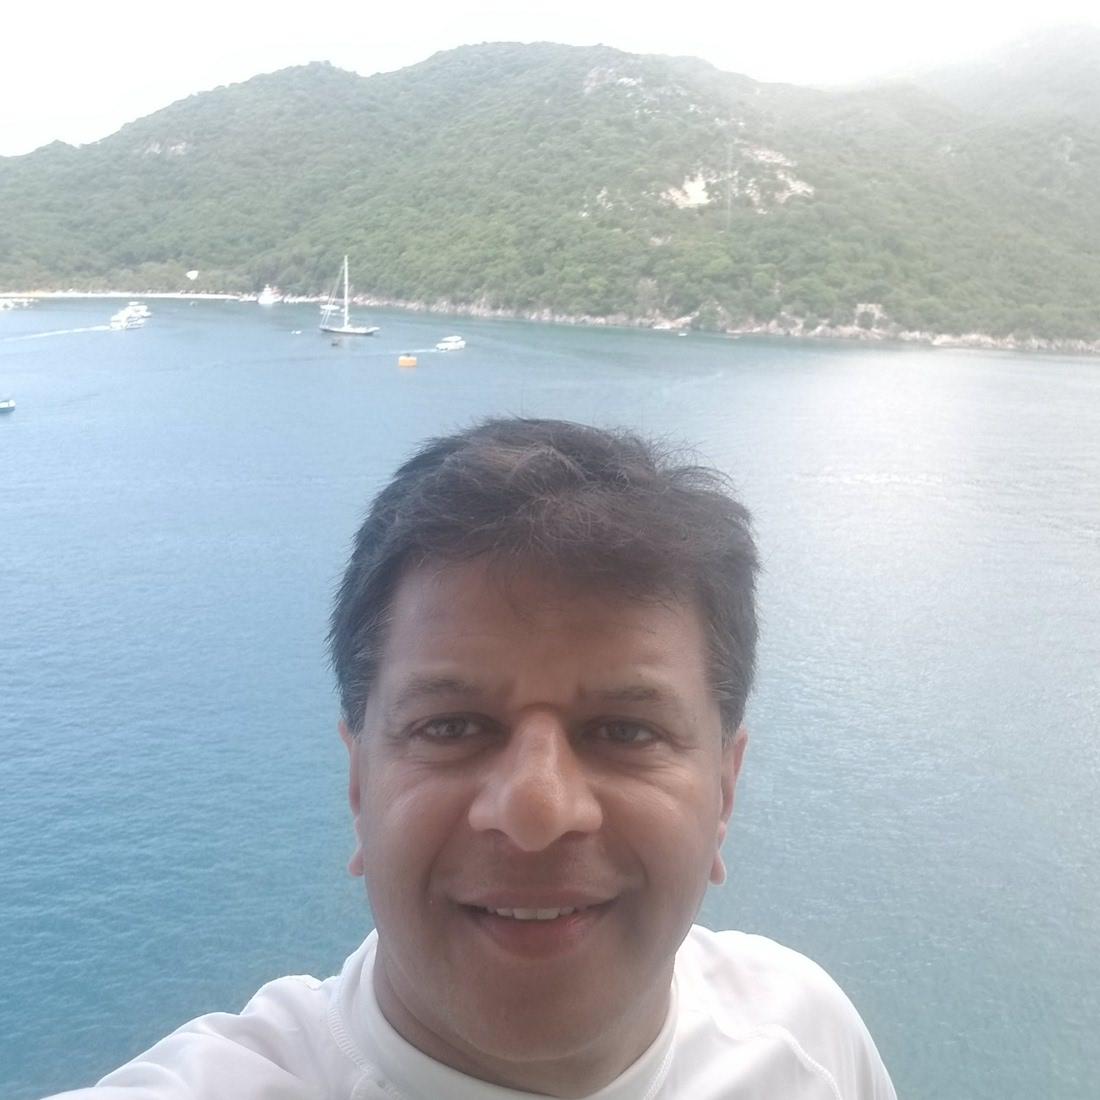 Vijay K. Shah, CCIM is Senior Vice President at Trademark Properties and a key team member for Shuckin' Shack Restaurant Franchising.